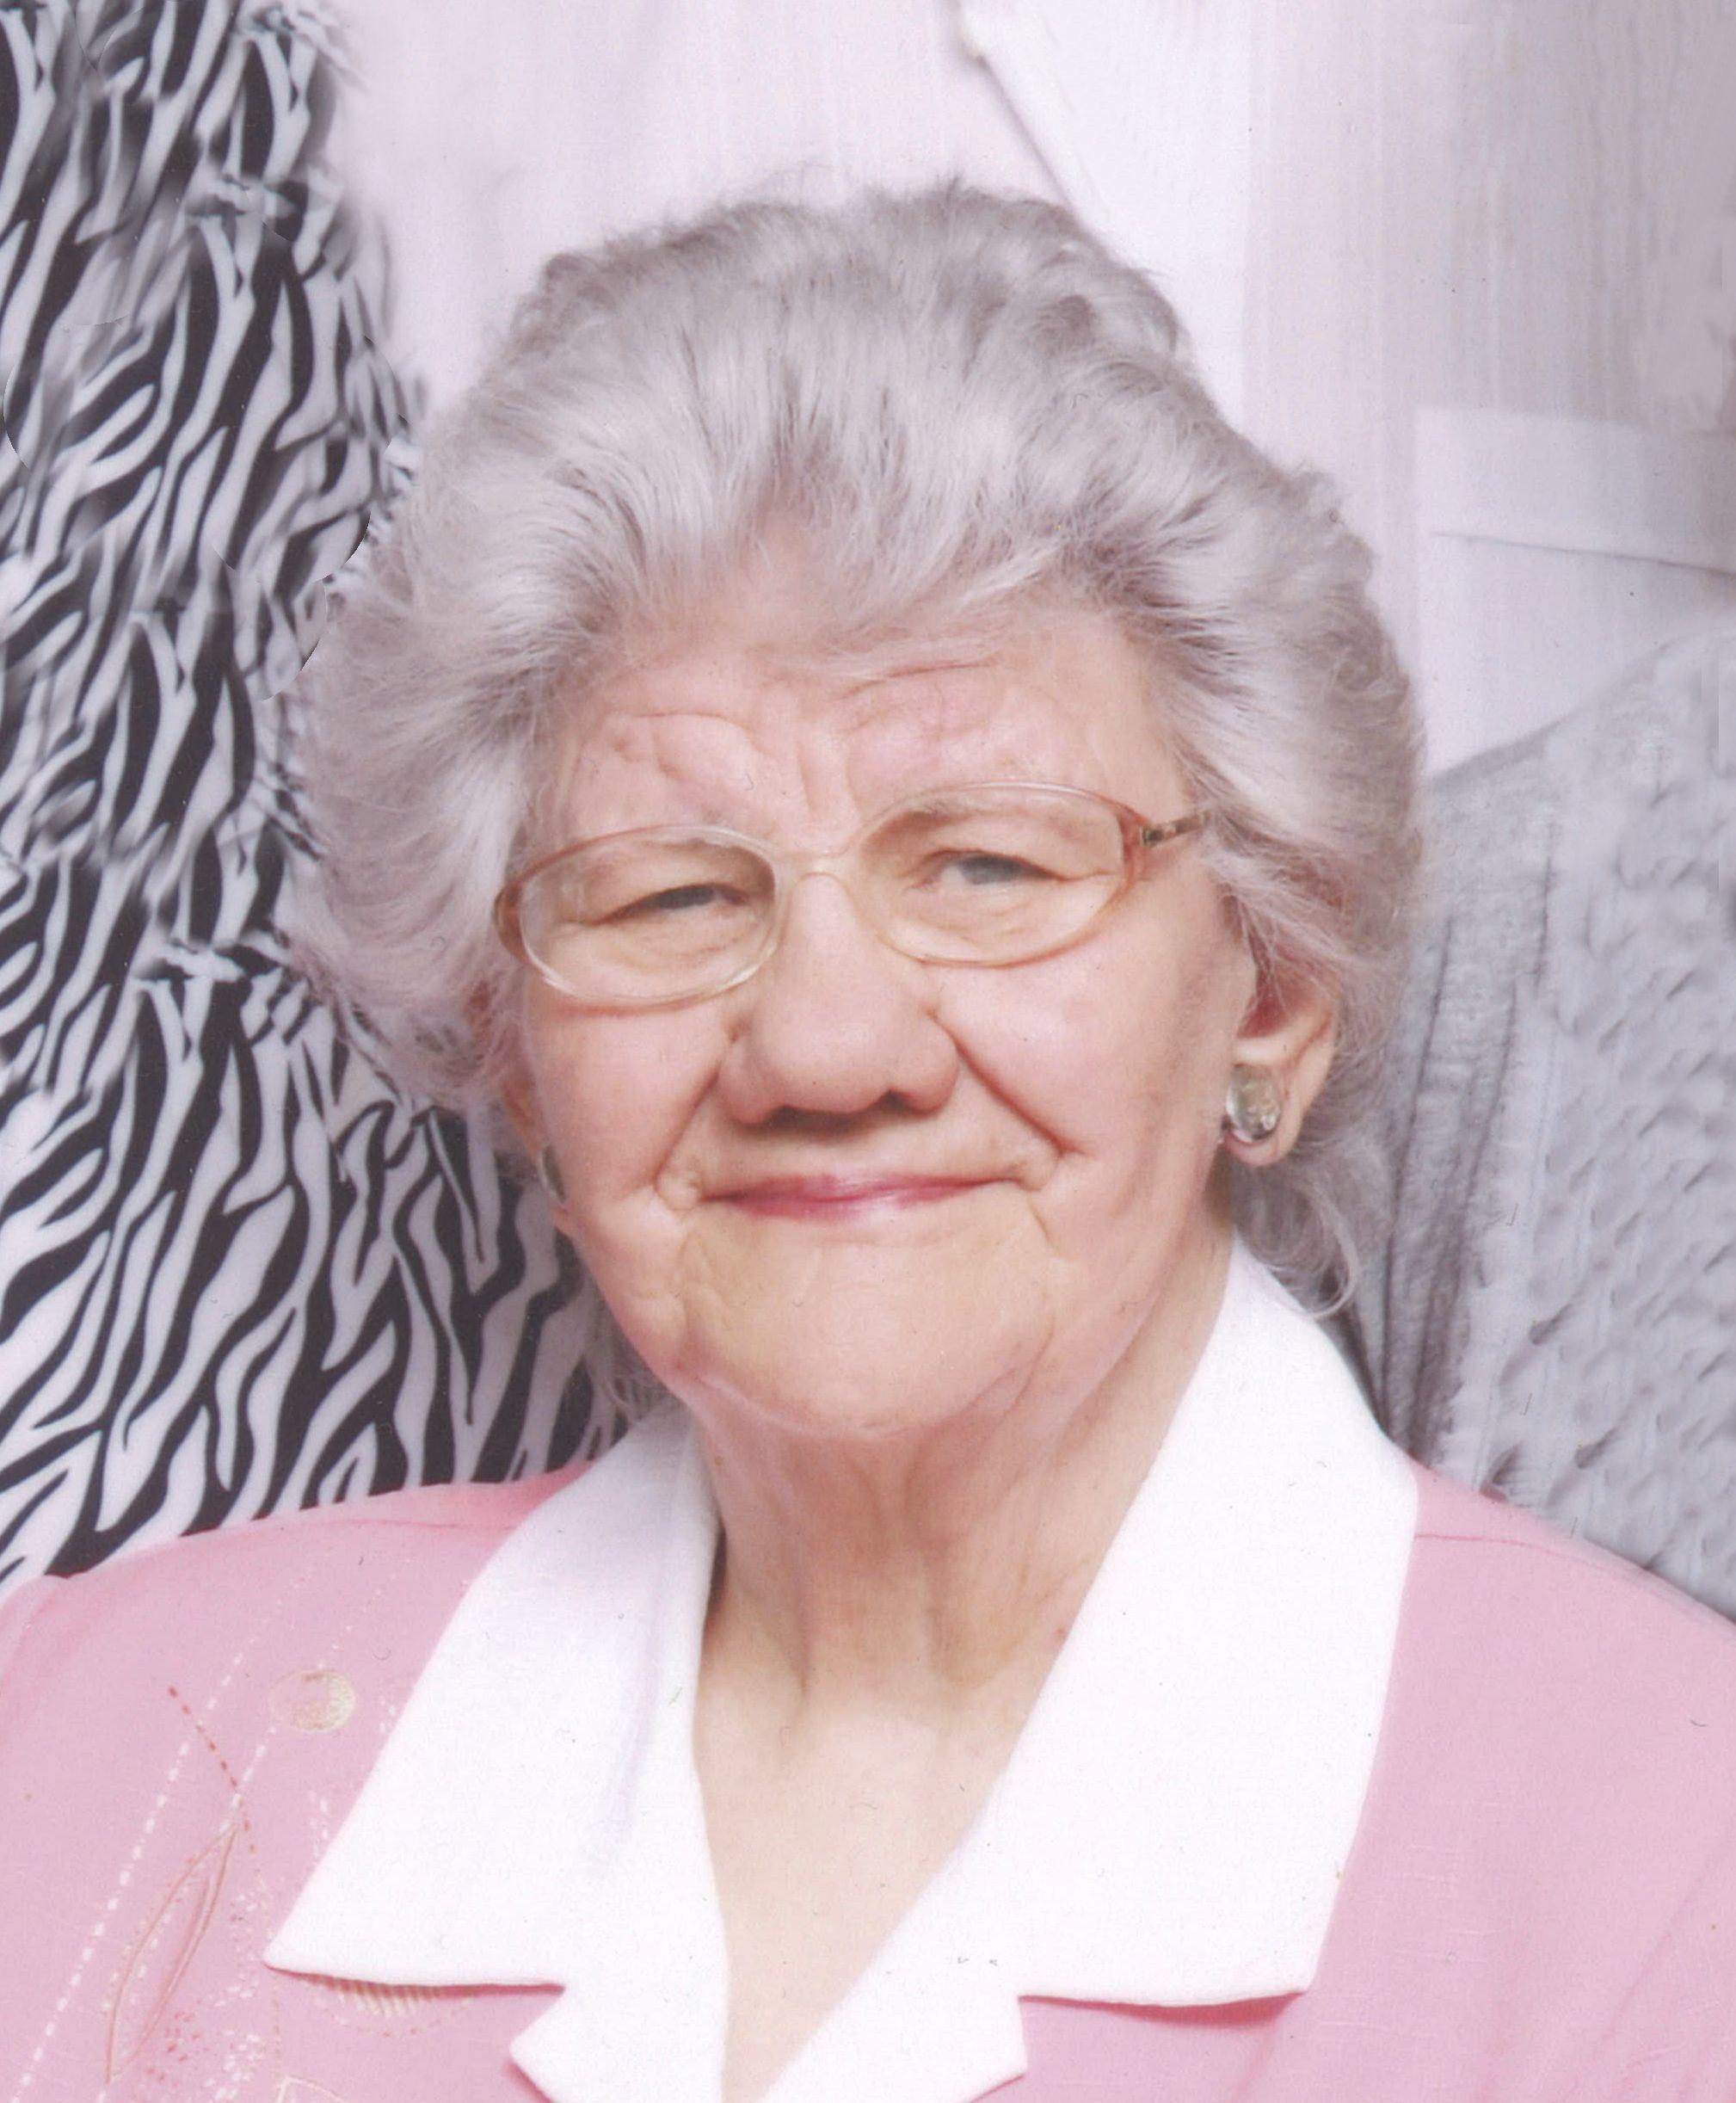 Joyce Iondry WaIIace